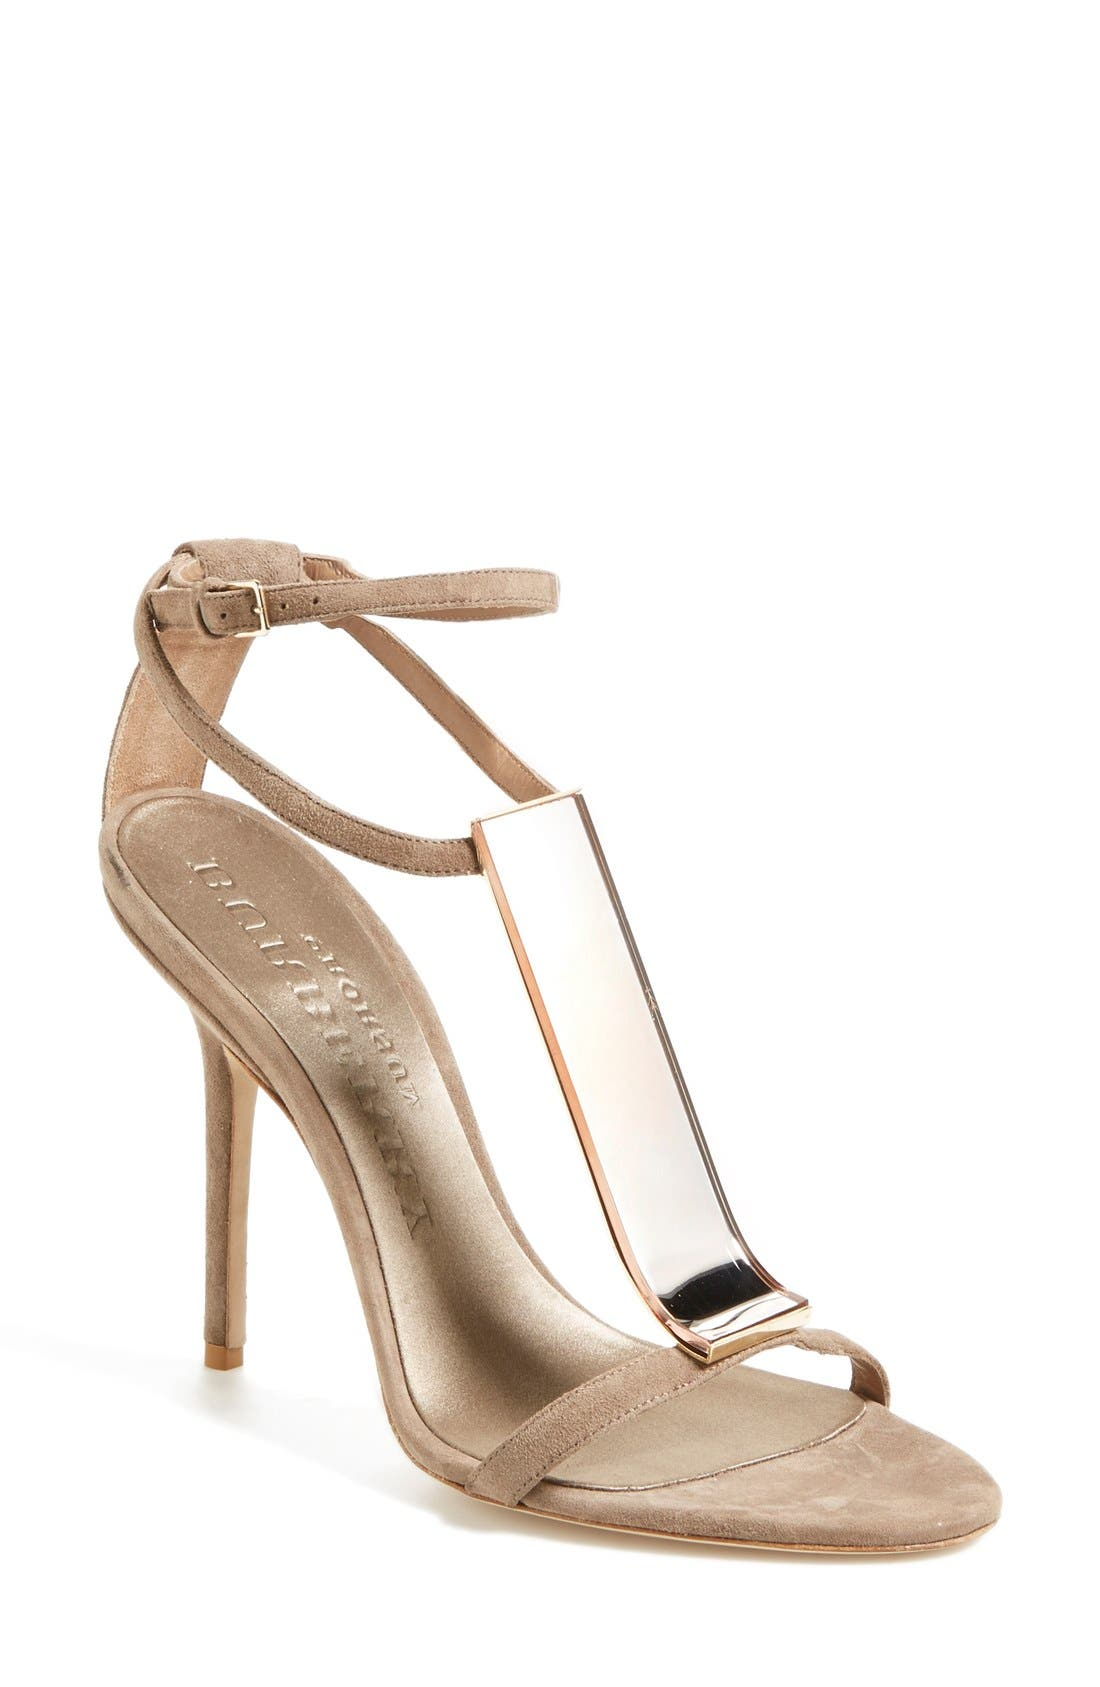 Main Image - Burberry 'Irving' Perspex® T-Bar Sandal (Women)